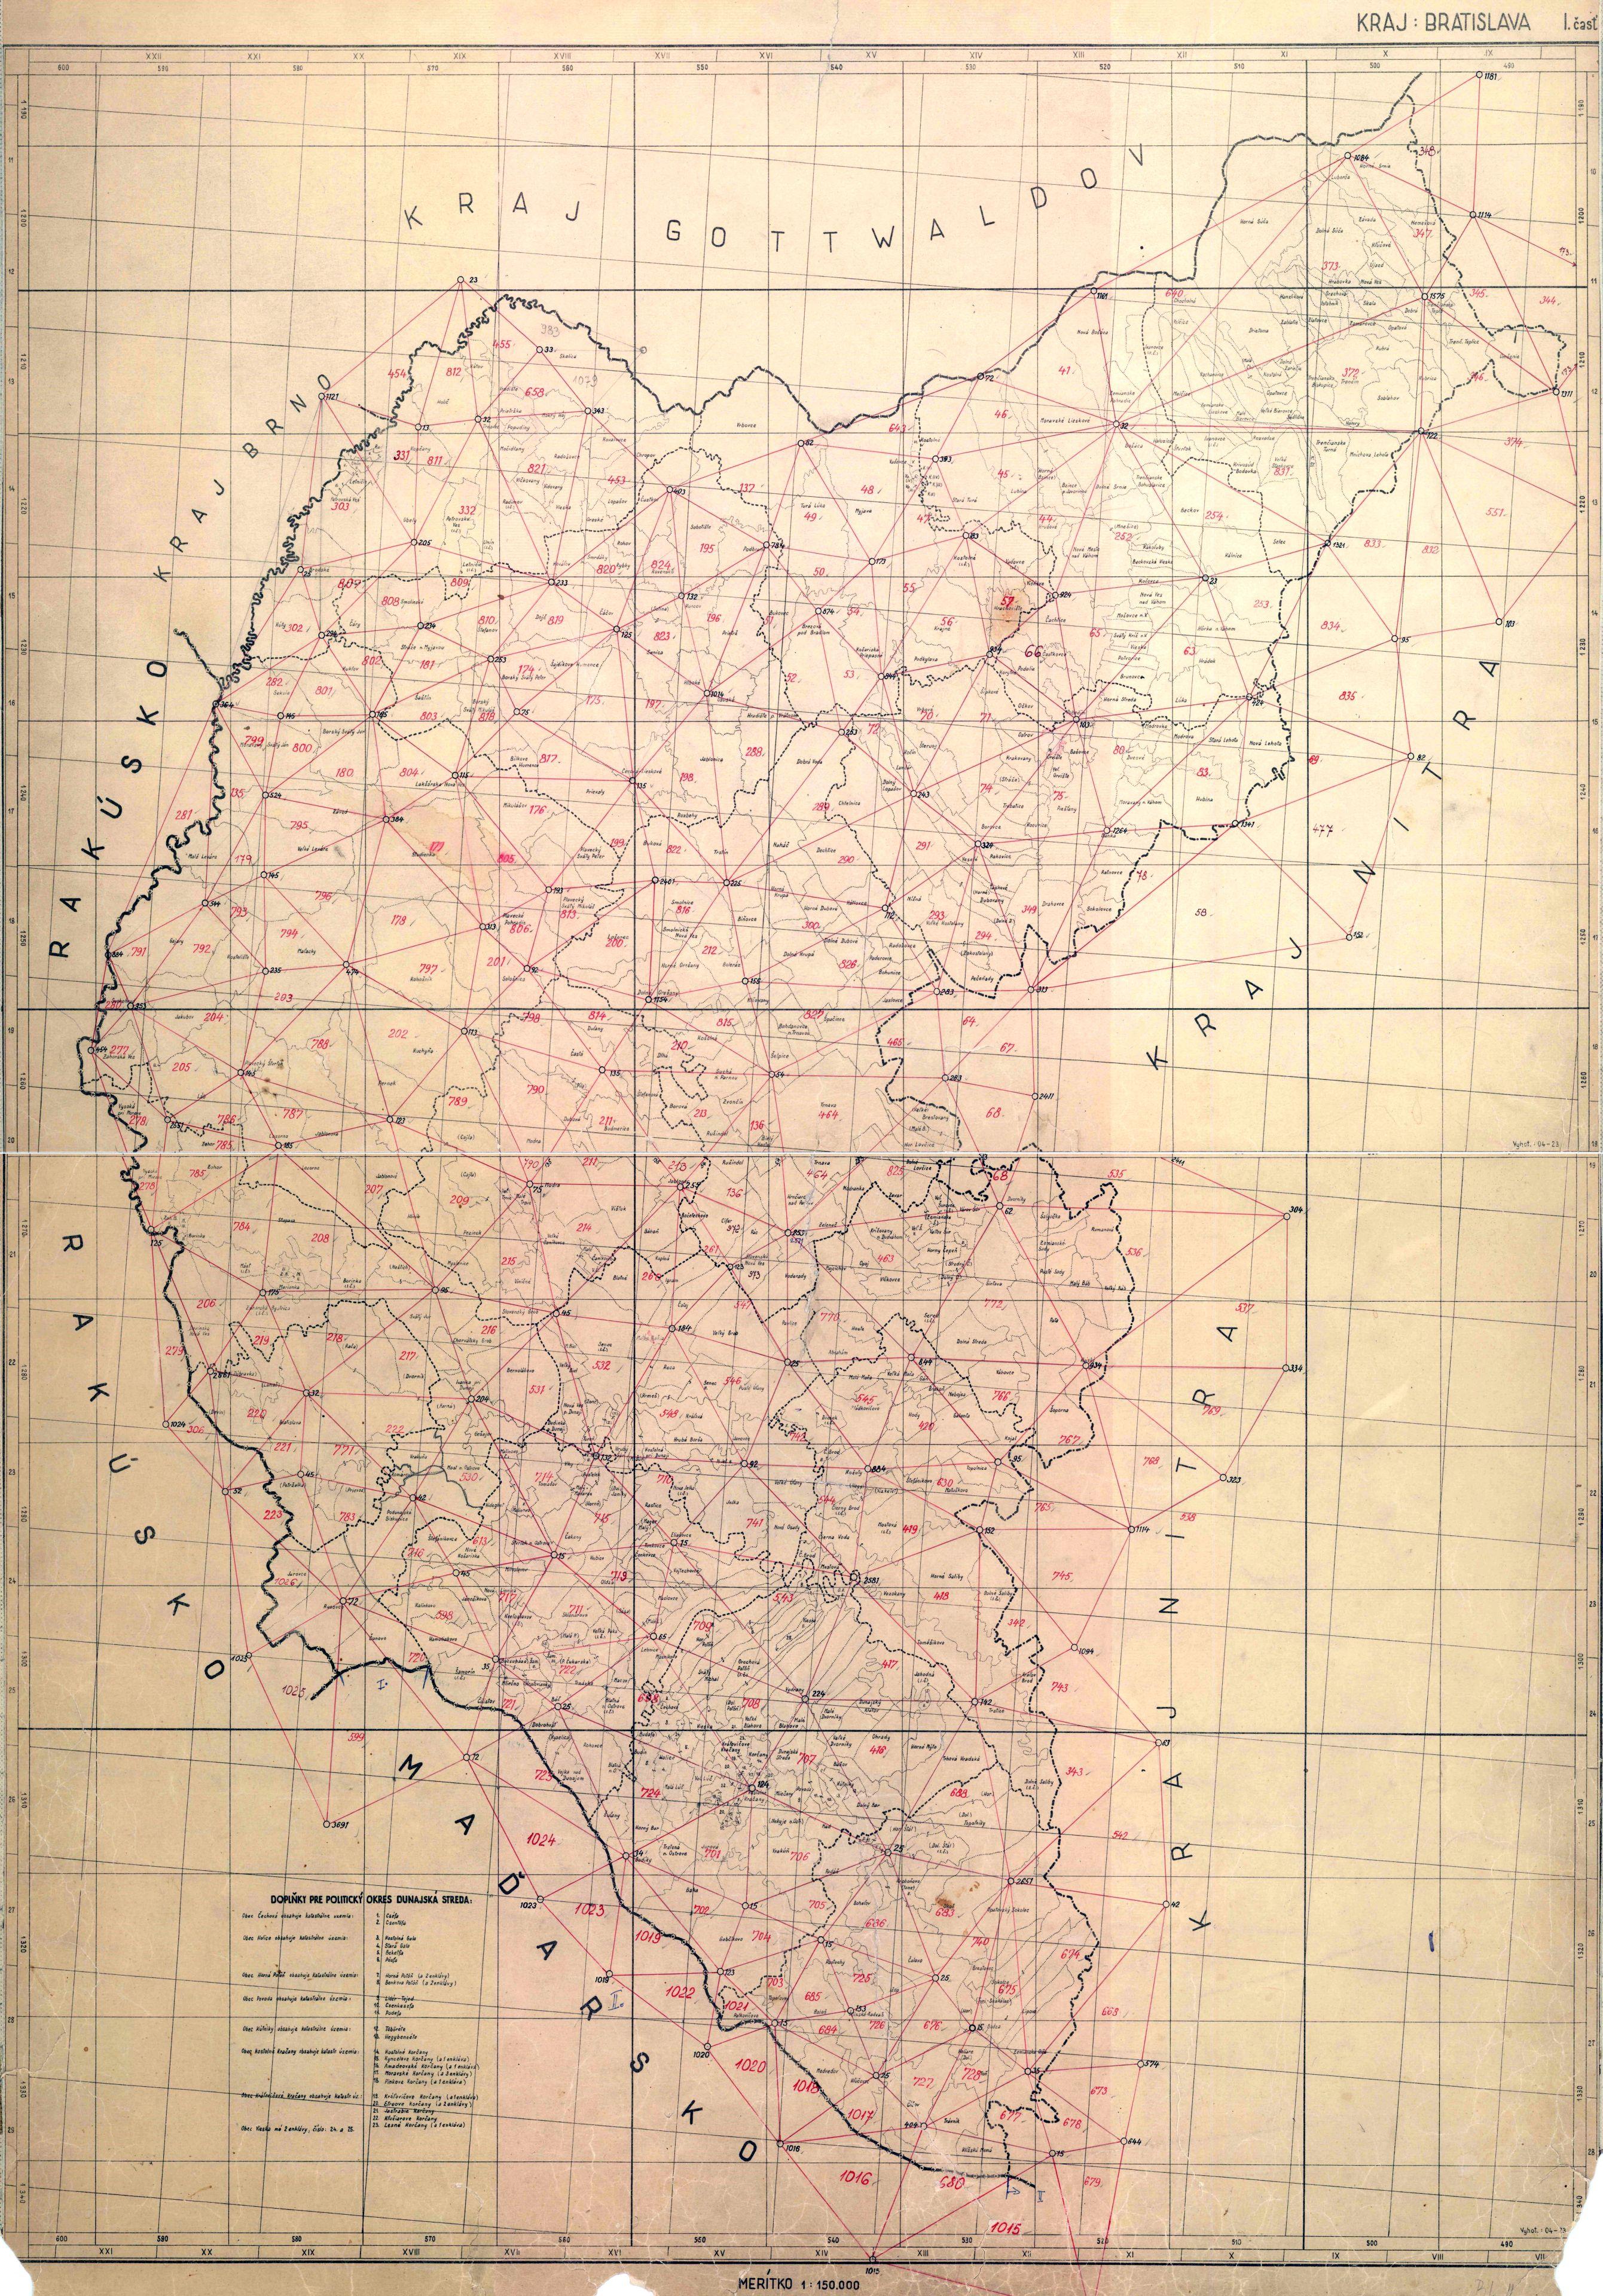 Mapy kataster